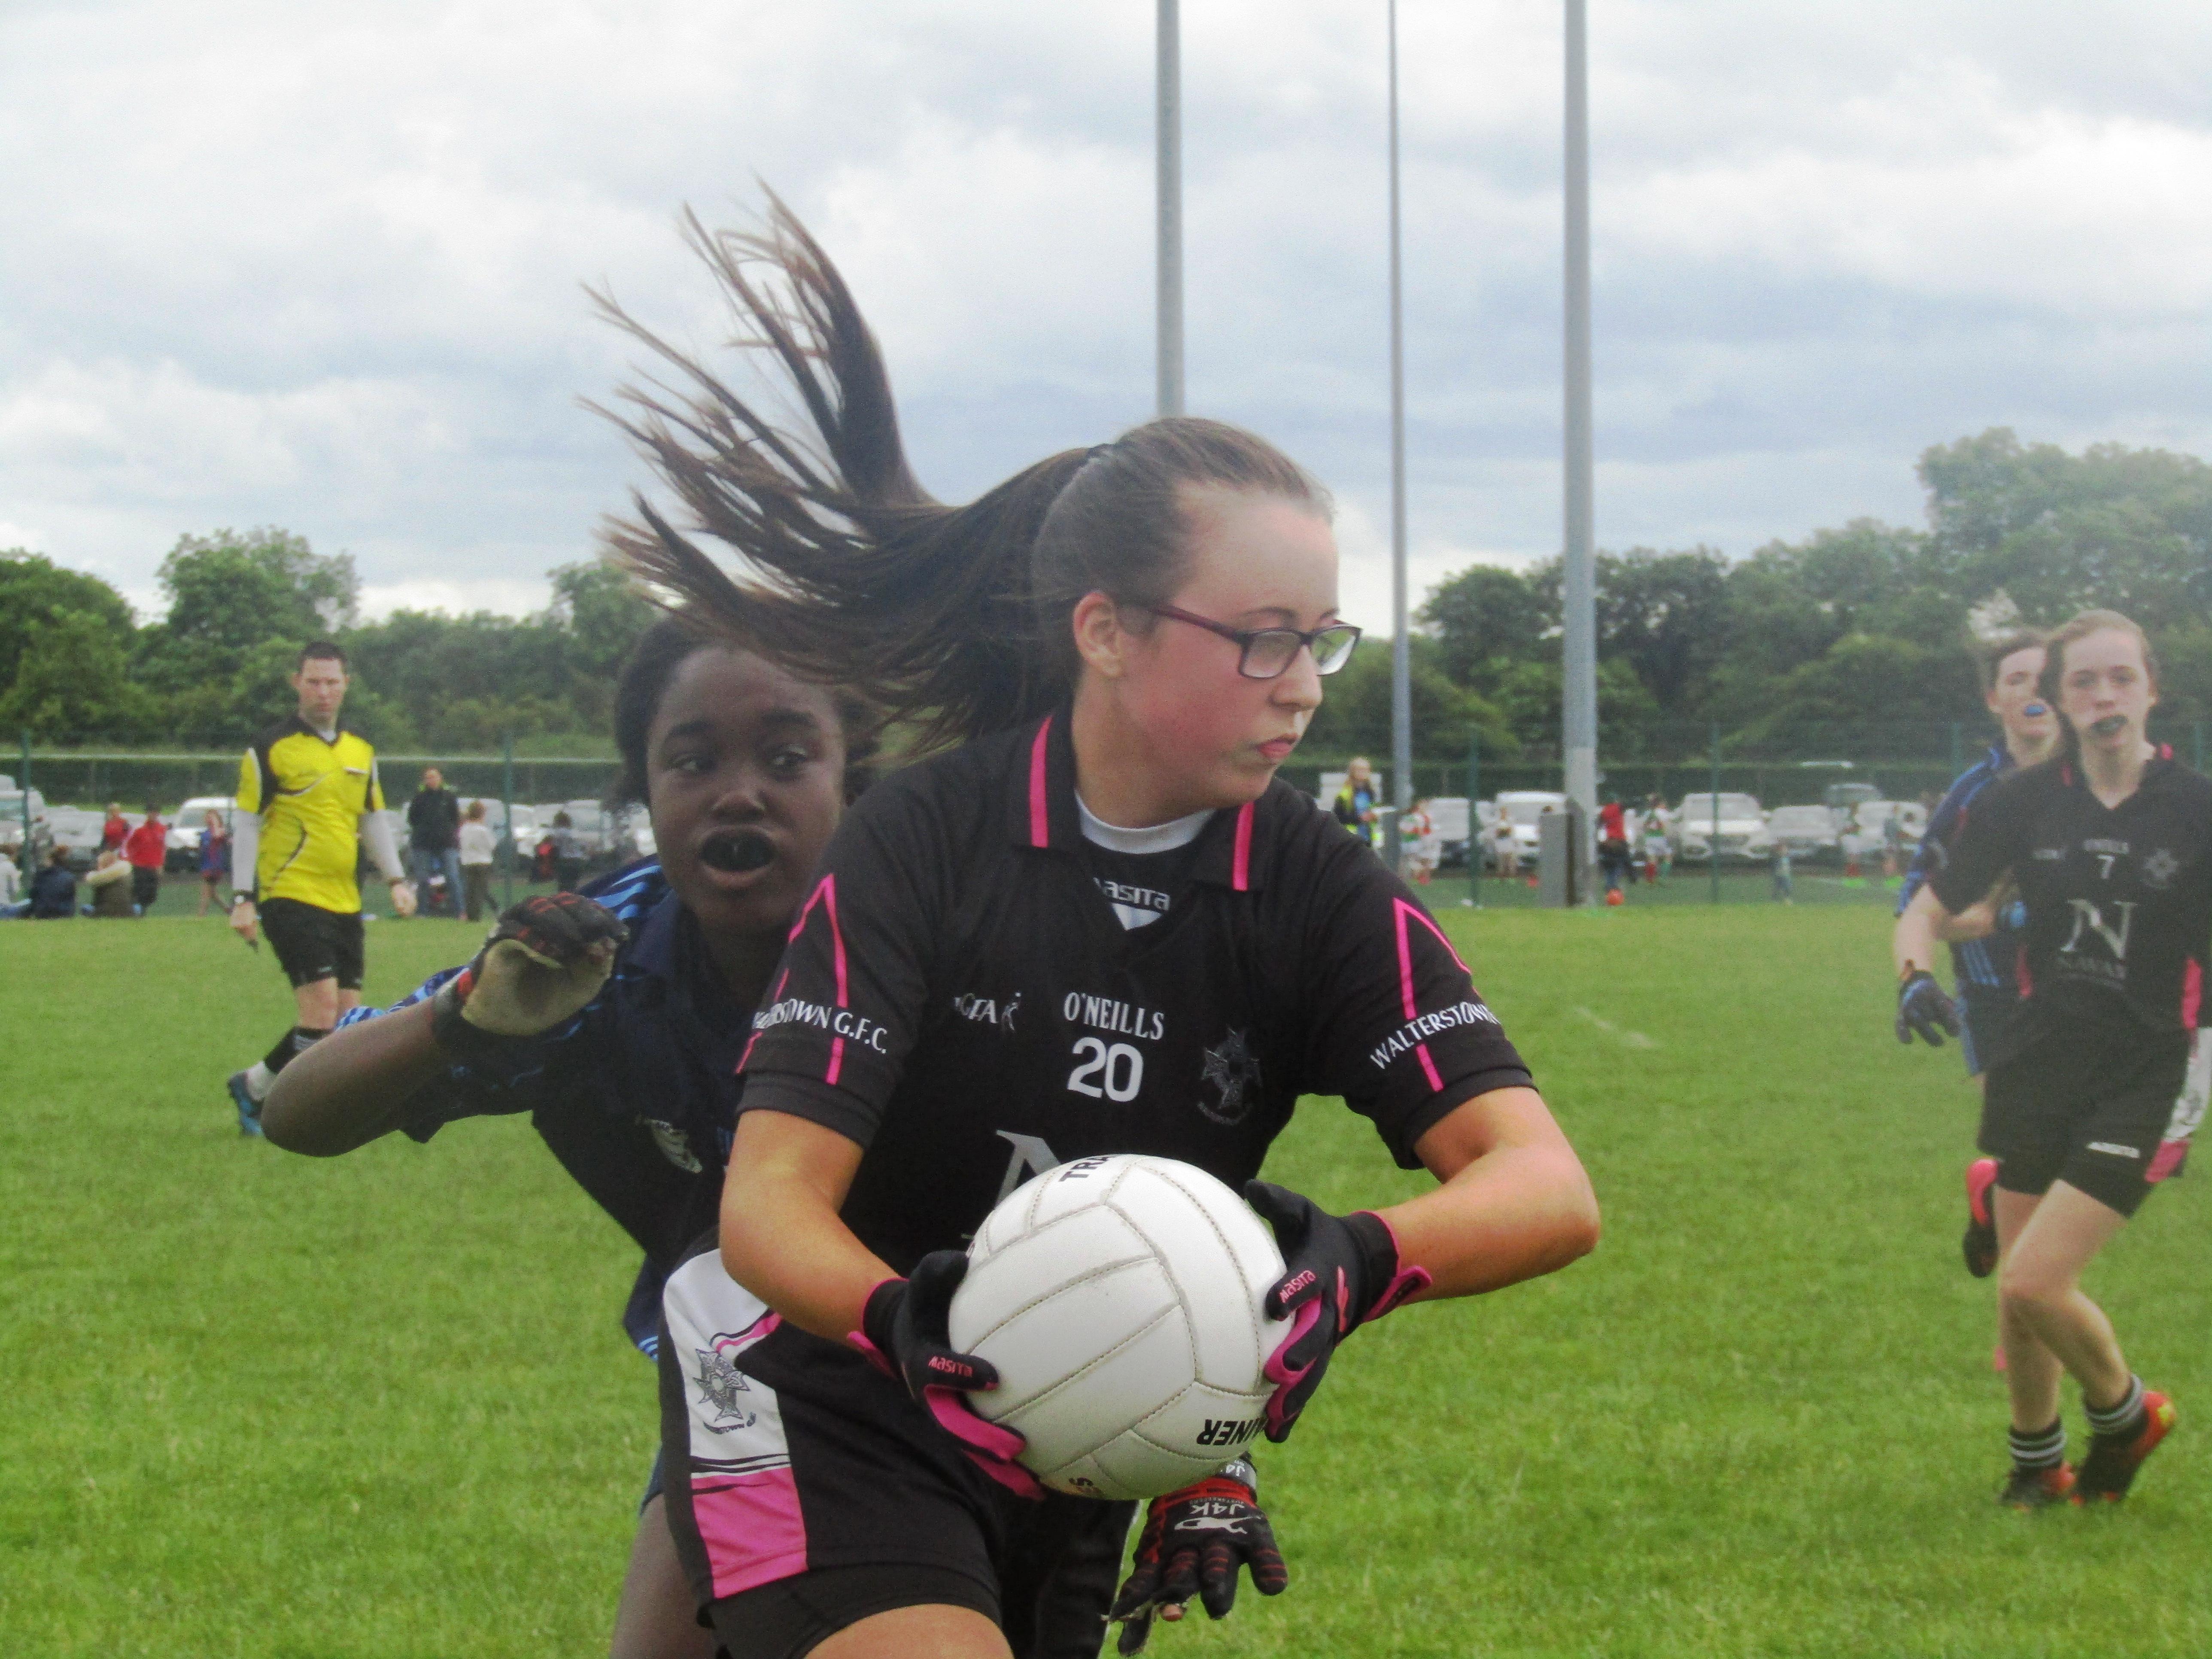 U14 Girls loose Shield final in 3rd minute of injury time.